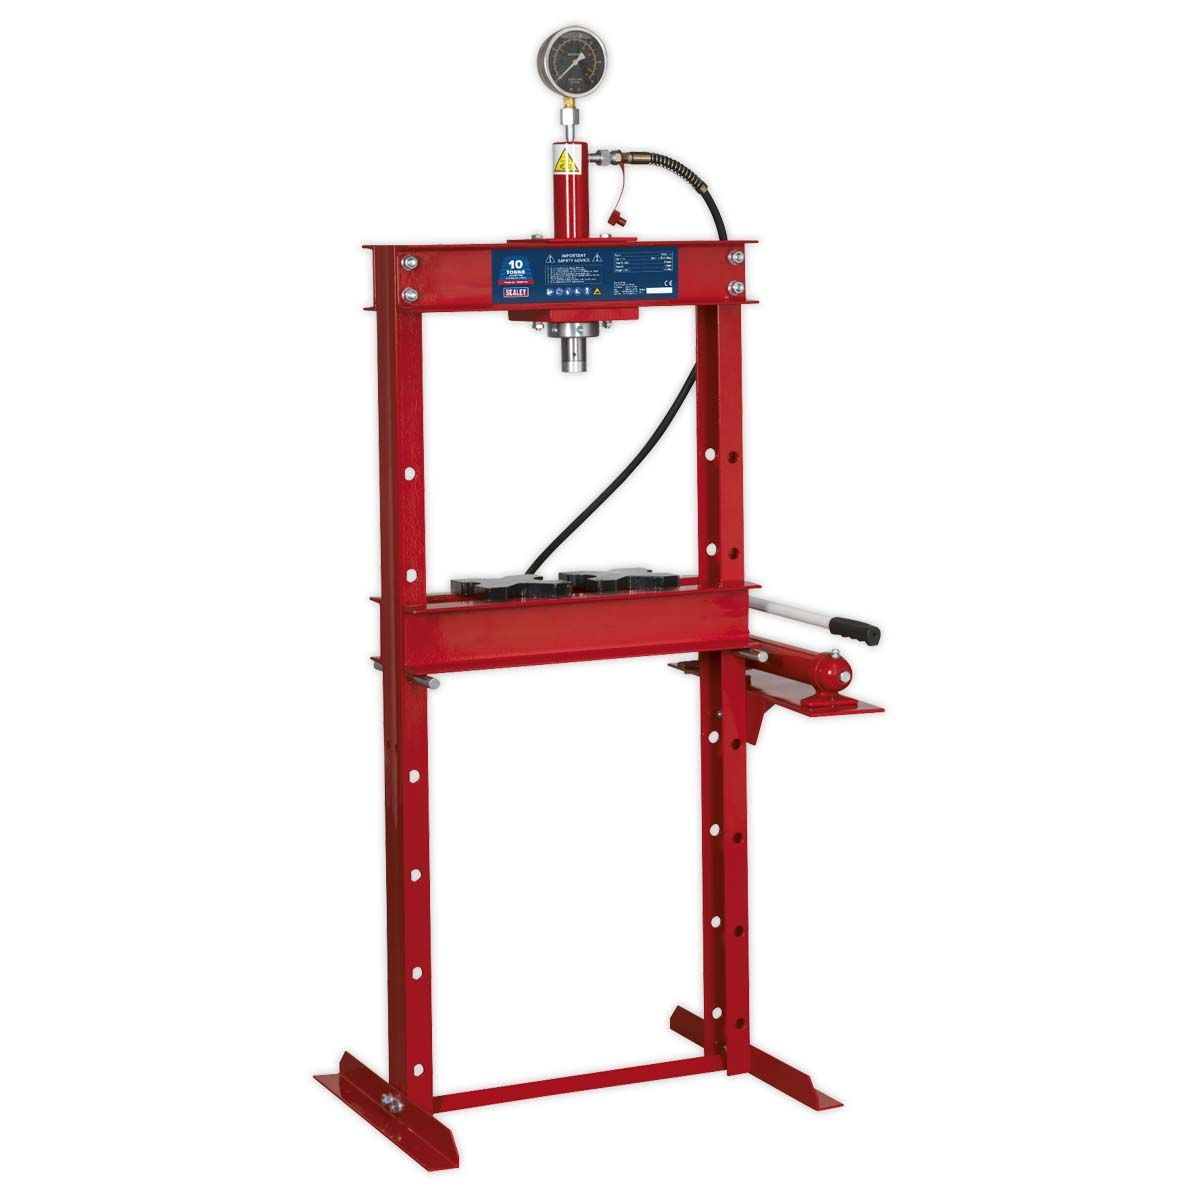 Sealey Hydraulic Press 10tonne Floor Type